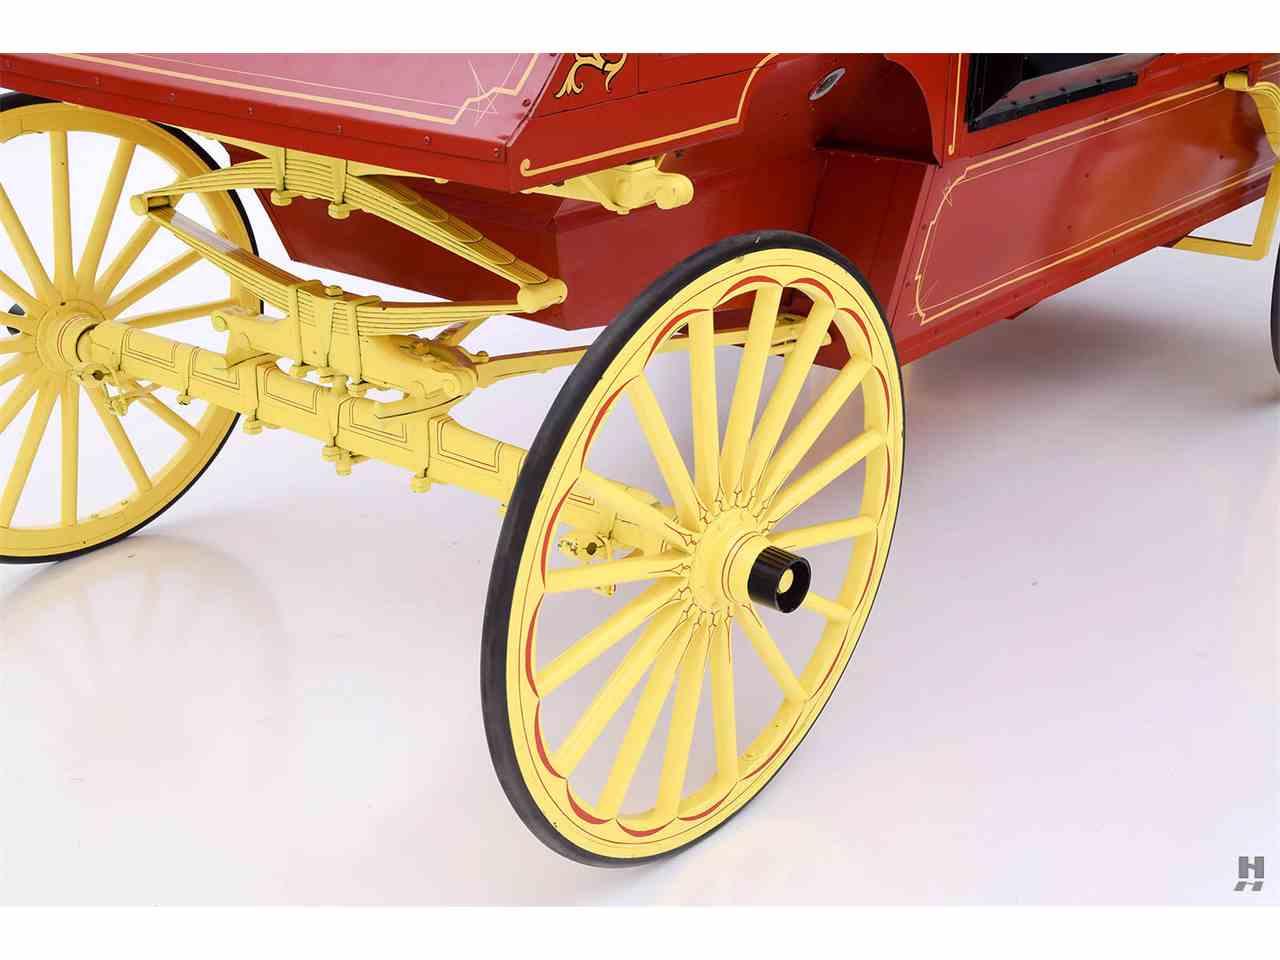 Large Picture of Classic 1910 Cretors Model D - $68,500.00 Offered by Hyman Ltd. Classic Cars - JMNV